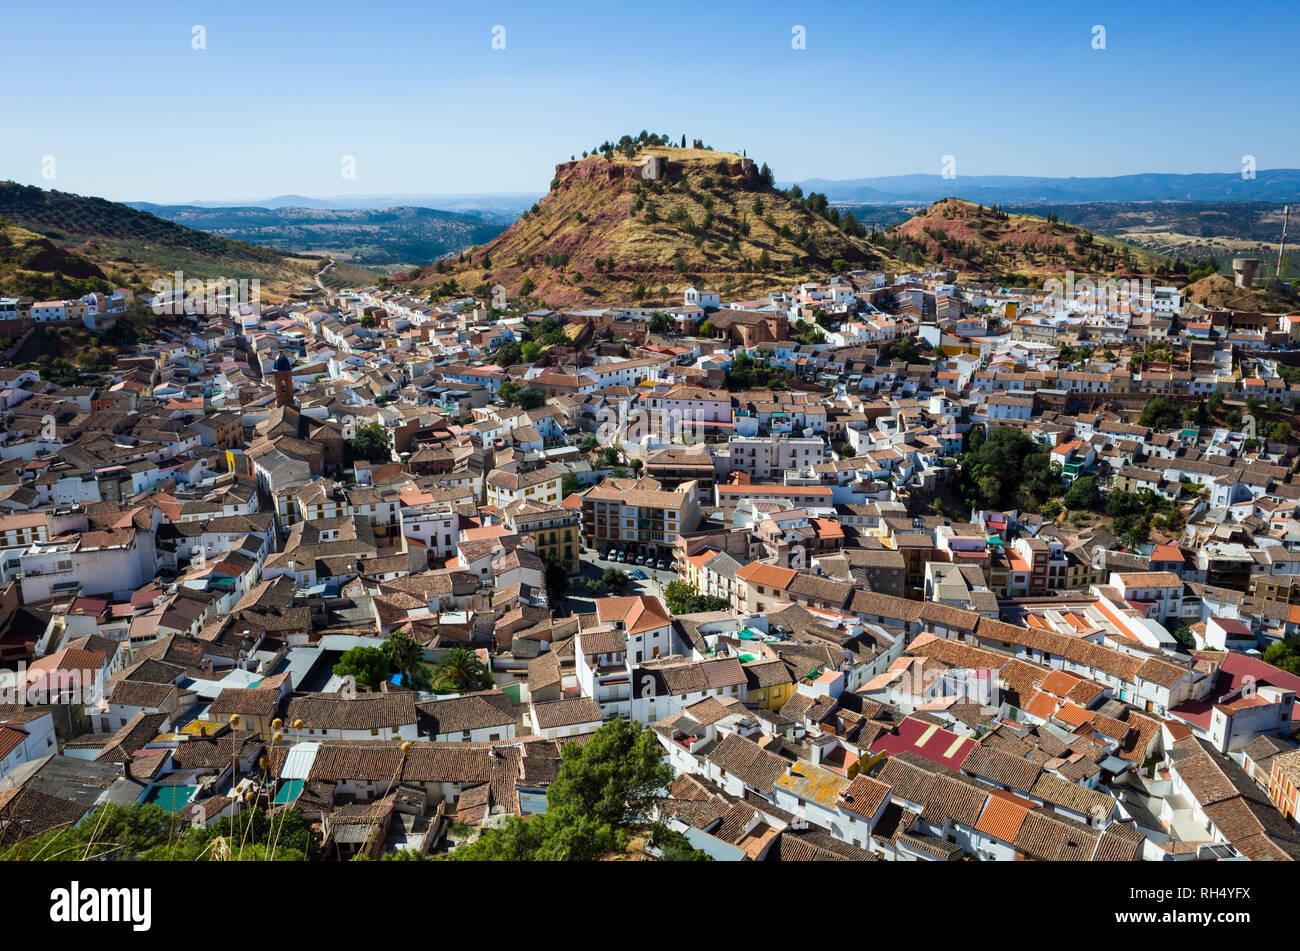 Overhead of Santisteban del Puerto, Jaen province, Andalusia, Spain. Stock Photo